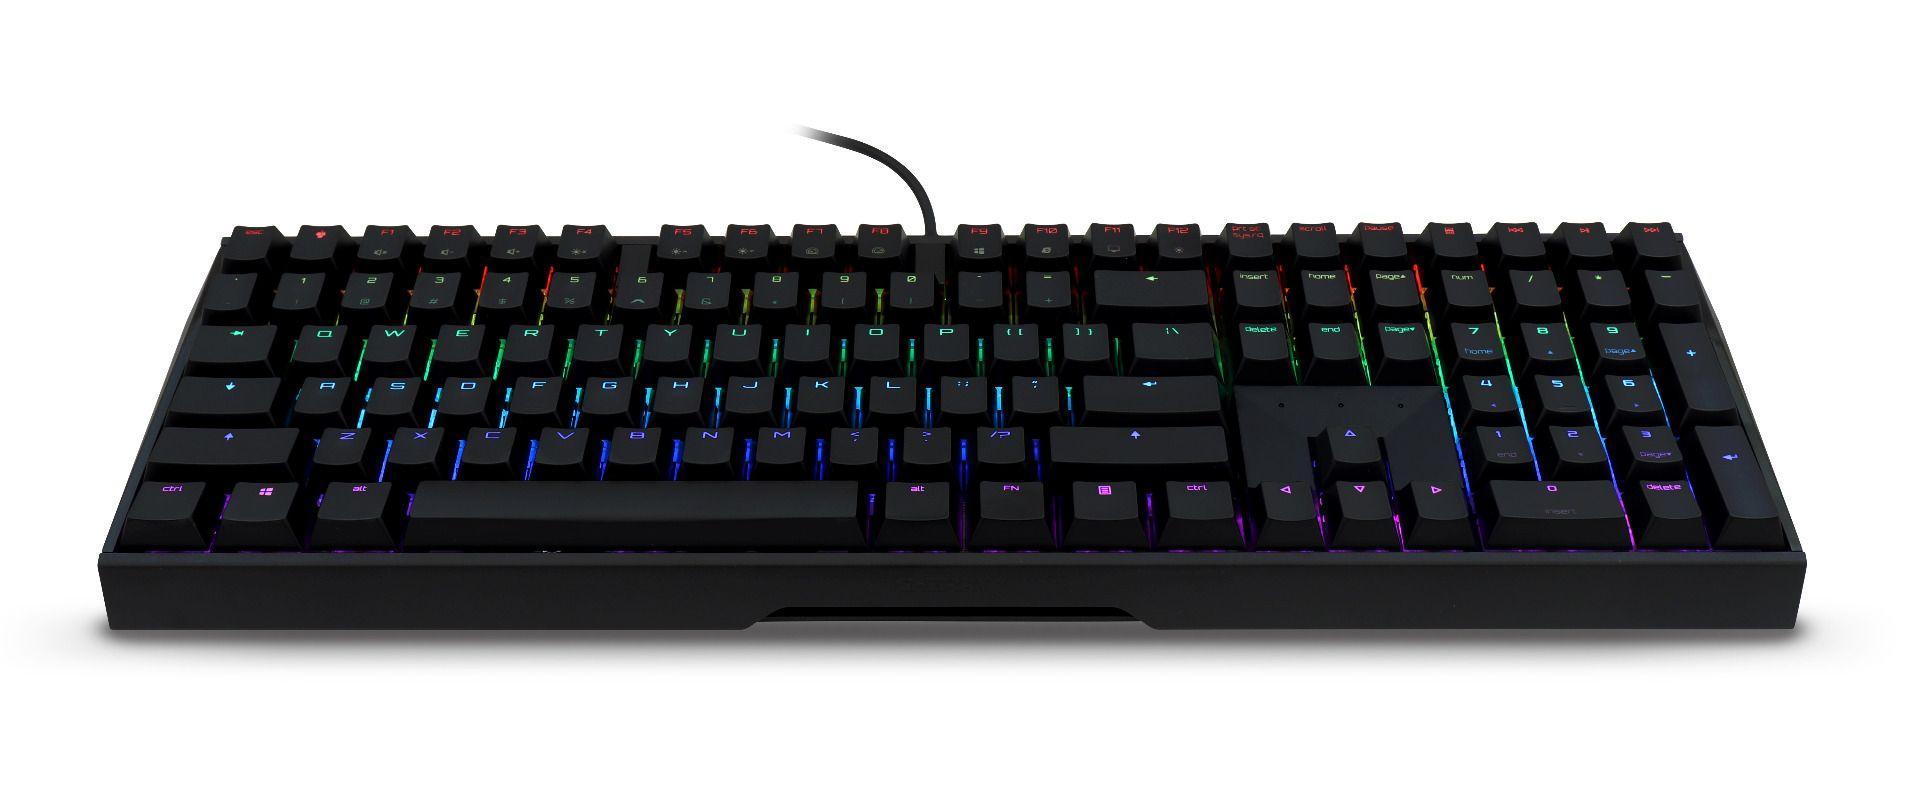 Геймърскa механична клавиатура Cherry MX Board 3.0S RGB, Cherry MX Brown-2